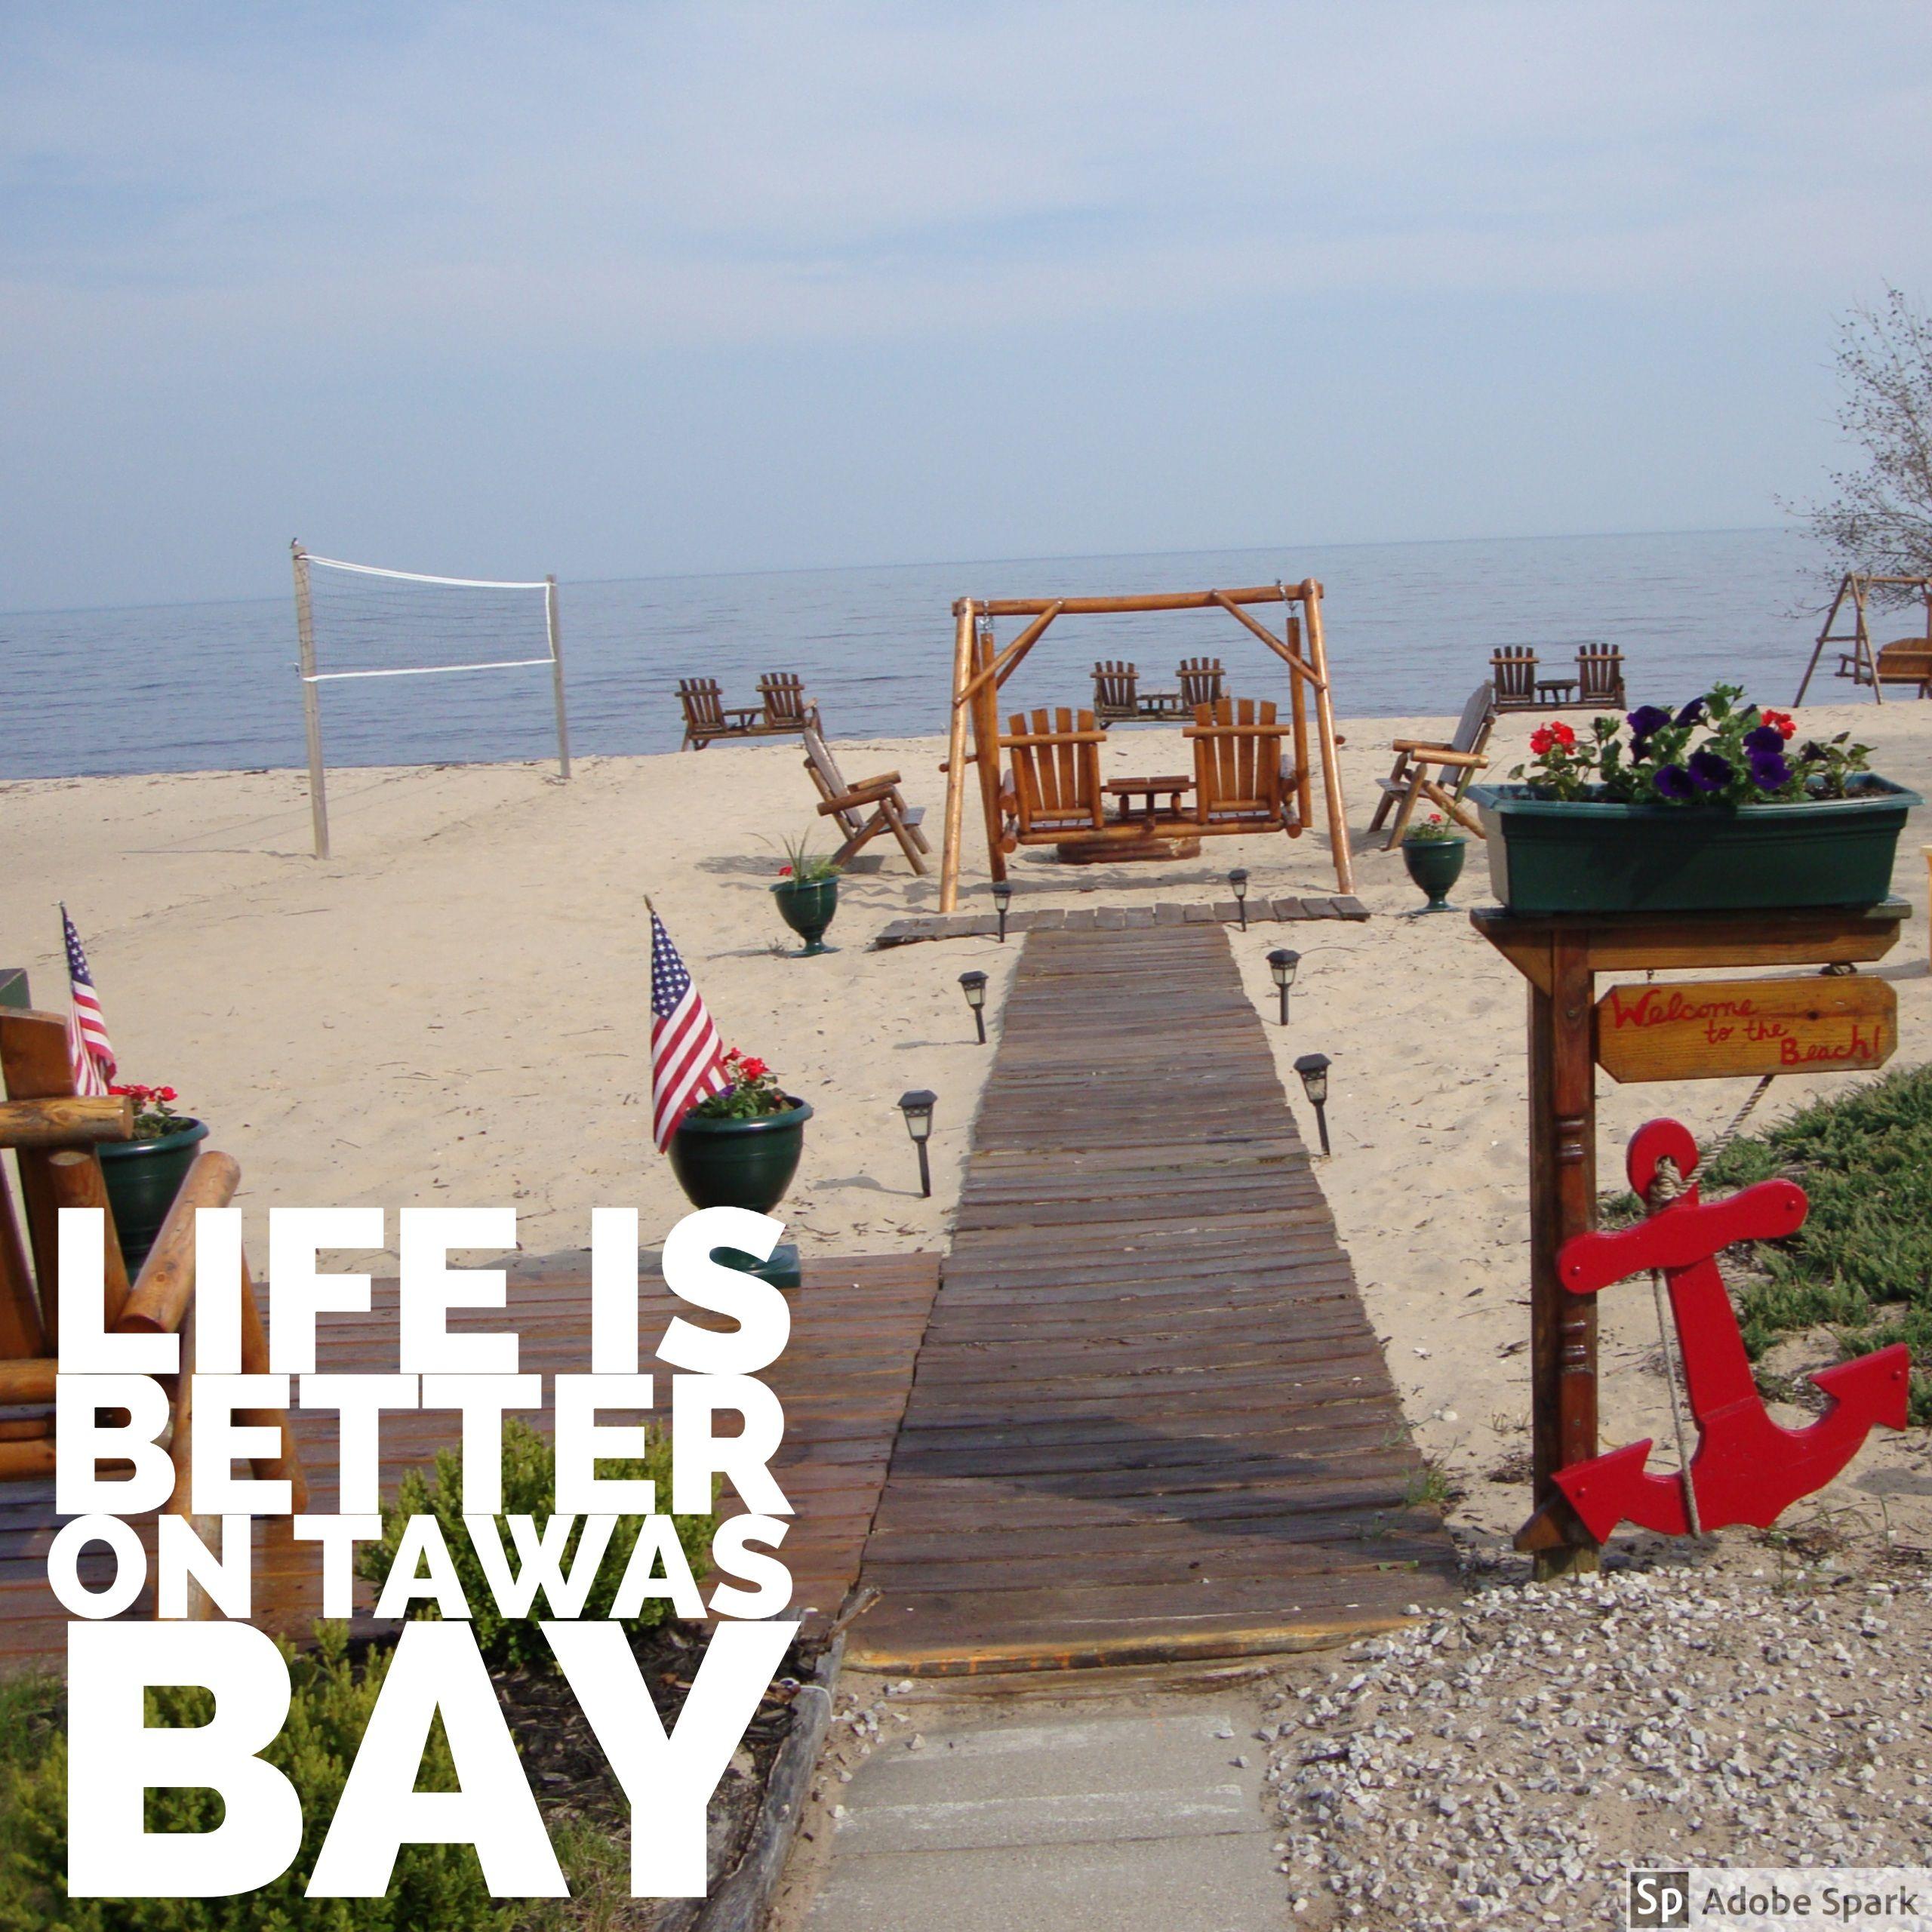 young s getaway beachfront resort located in tawas city sa tawas rh pinterest com